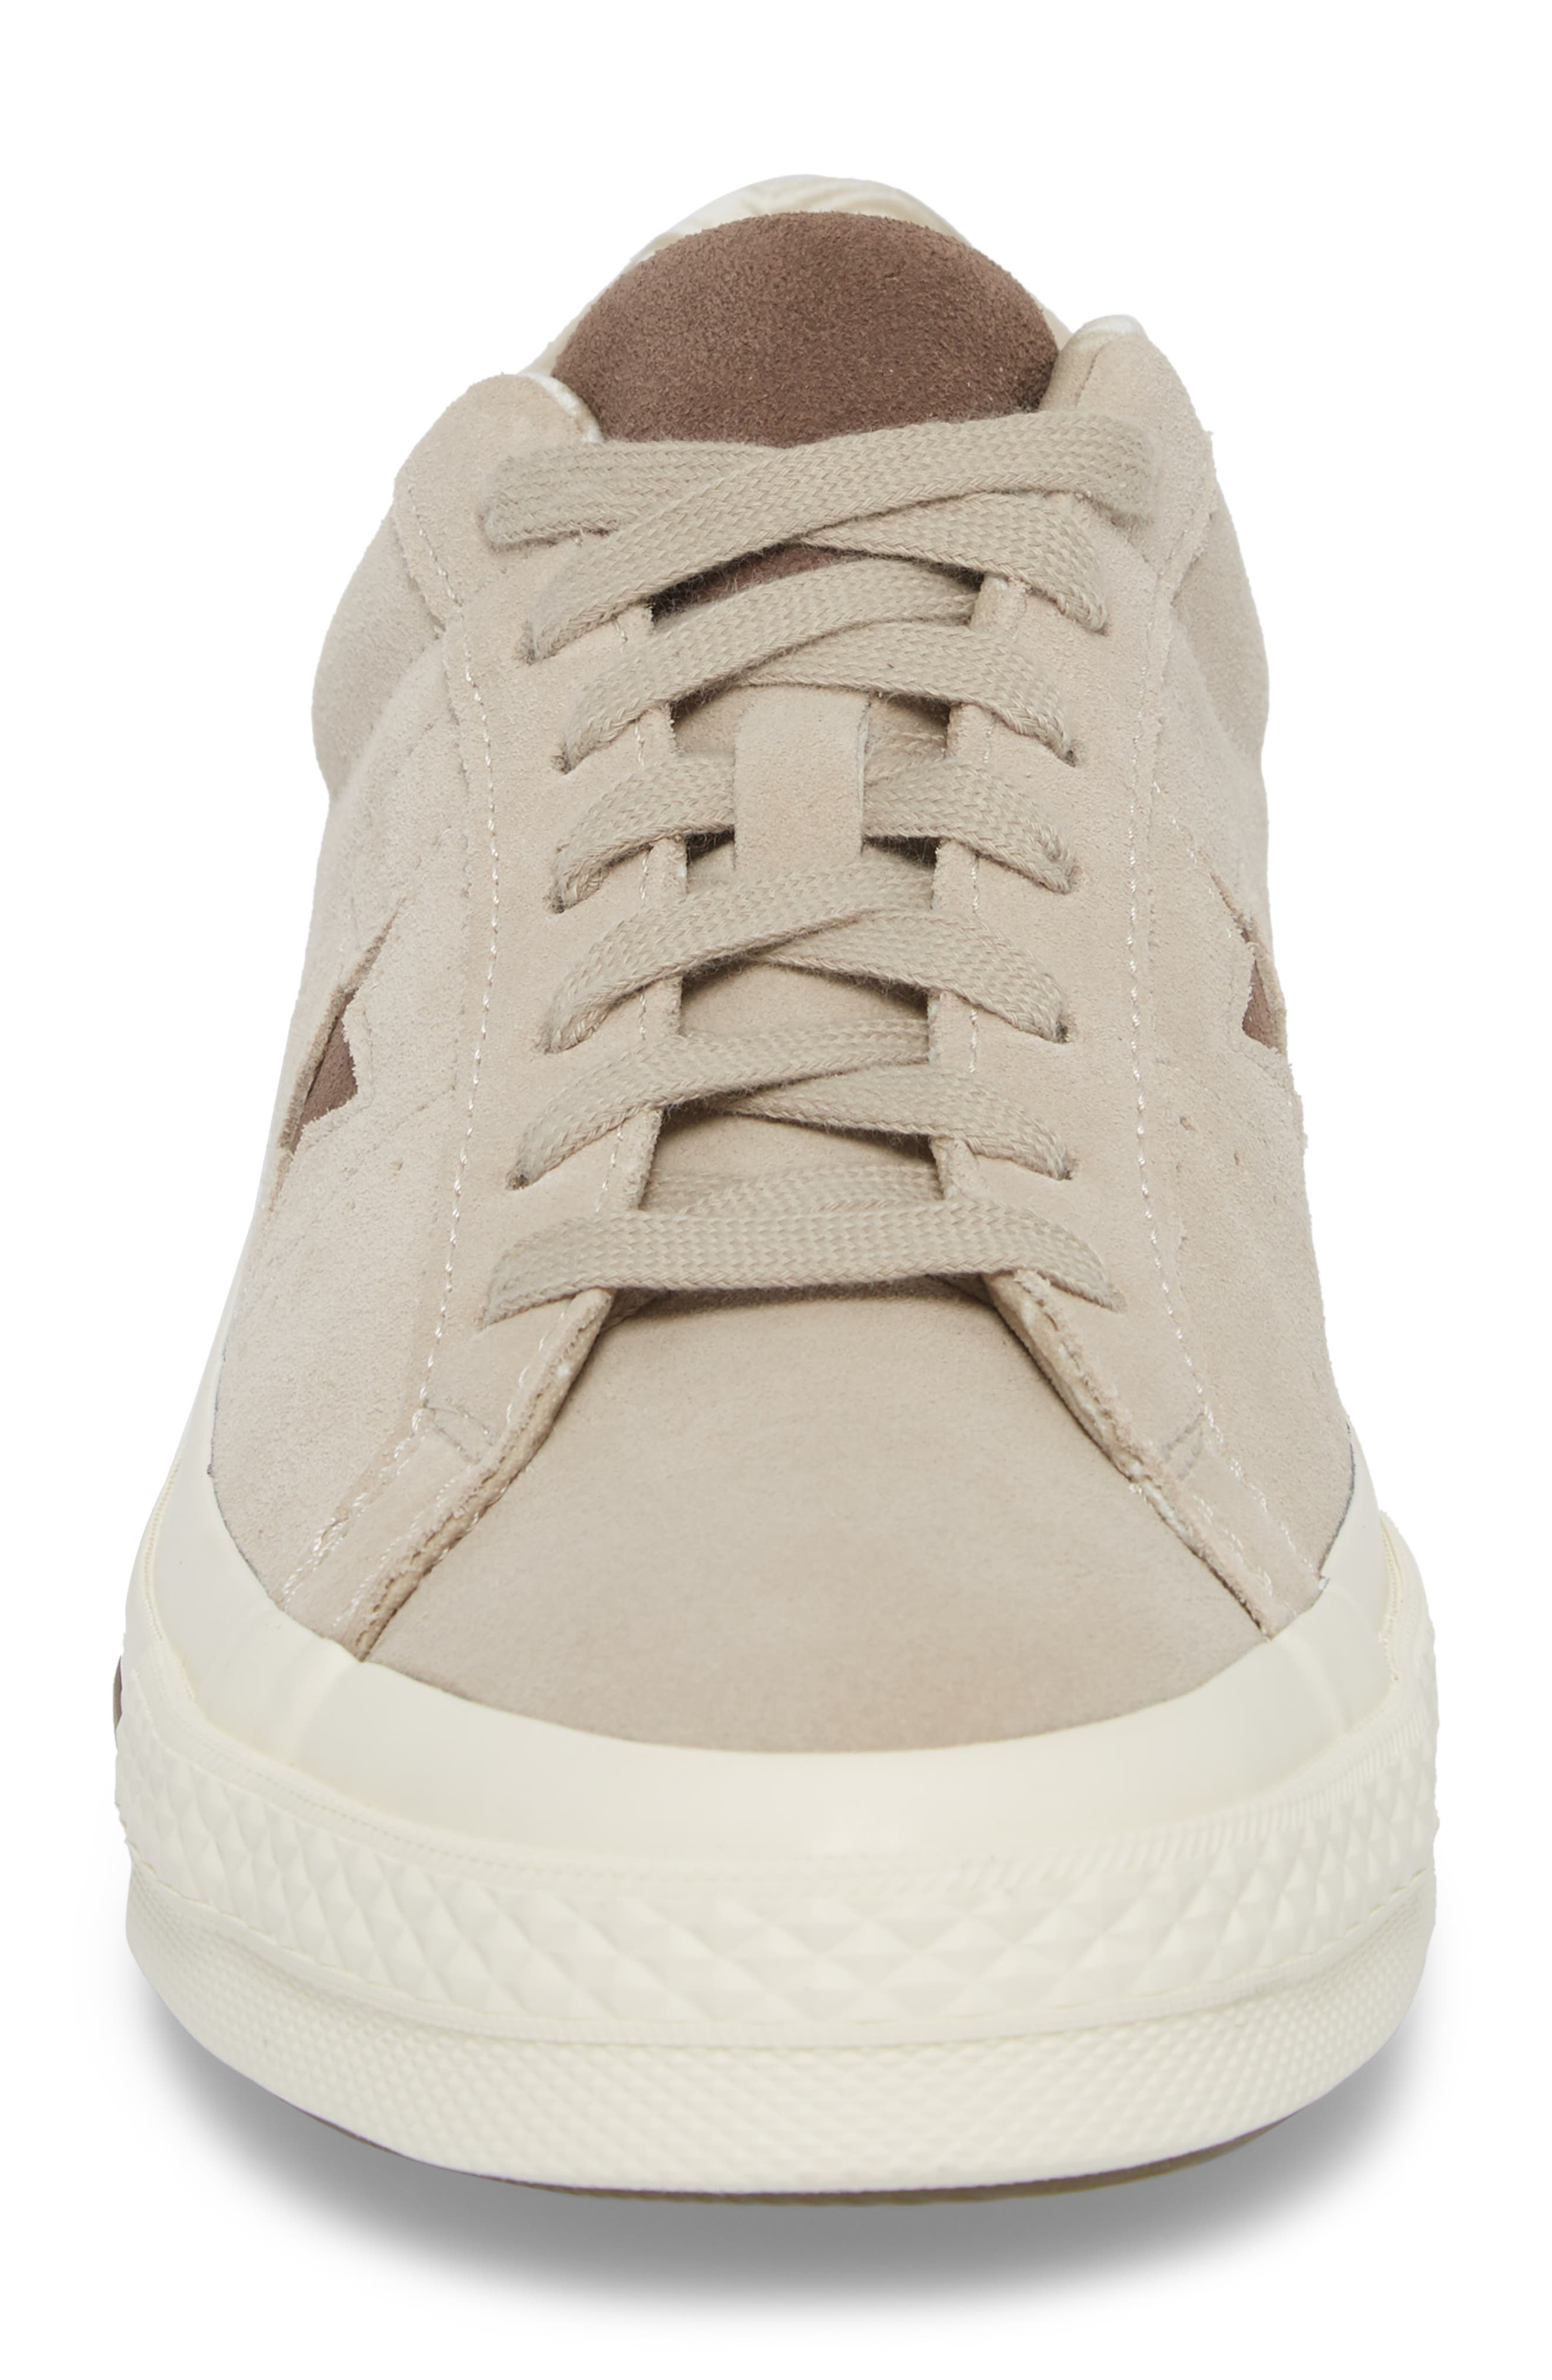 One-Star Tropical Sneaker,                             Alternate thumbnail 4, color,                             Khaki Suede